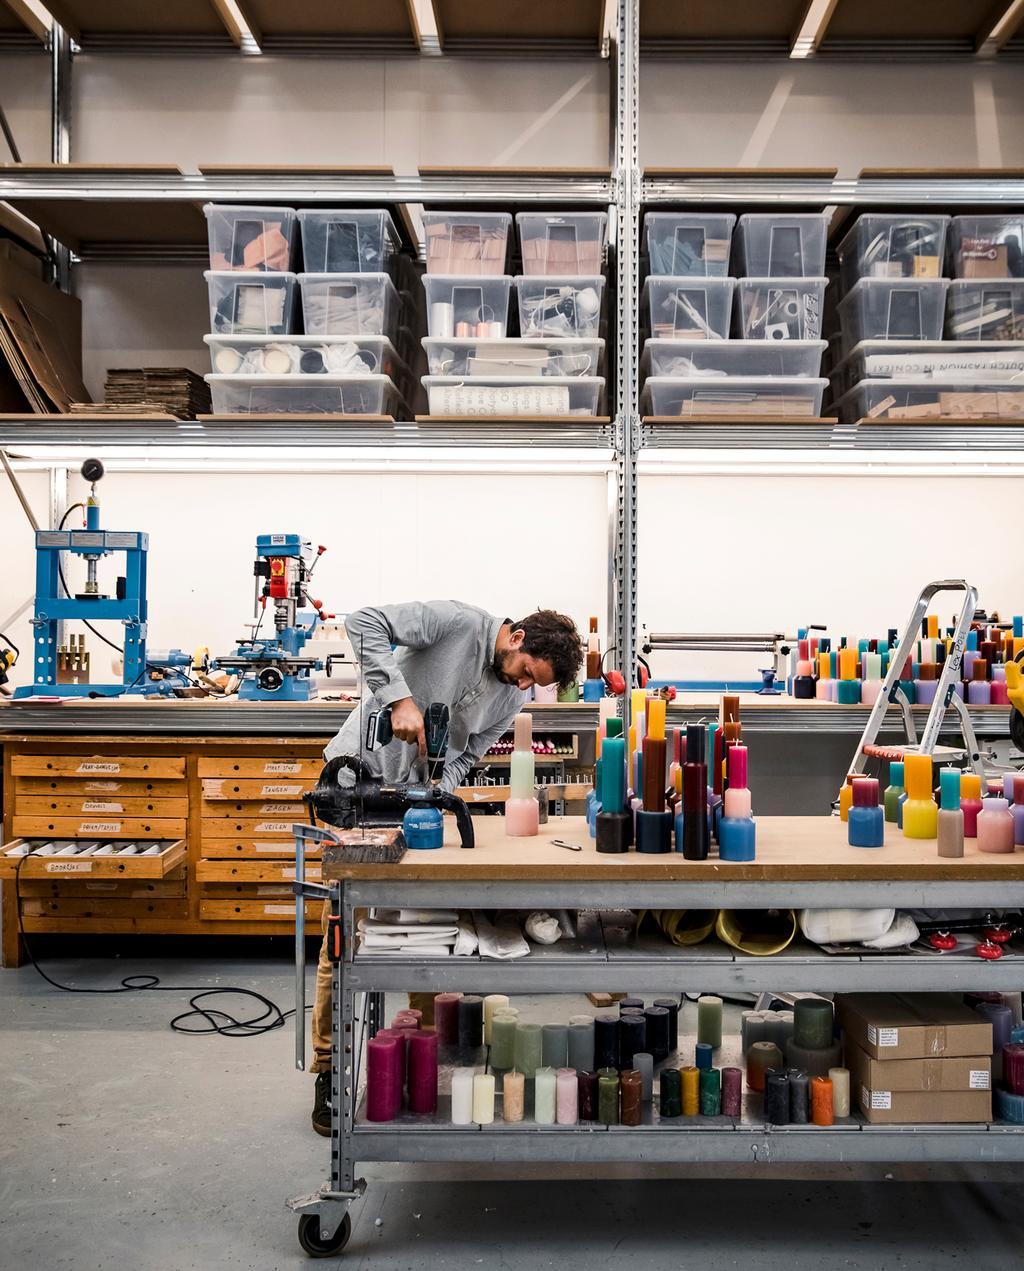 vtwonen 11-2019 | Ambacht Lex Pott atelier werkplaats